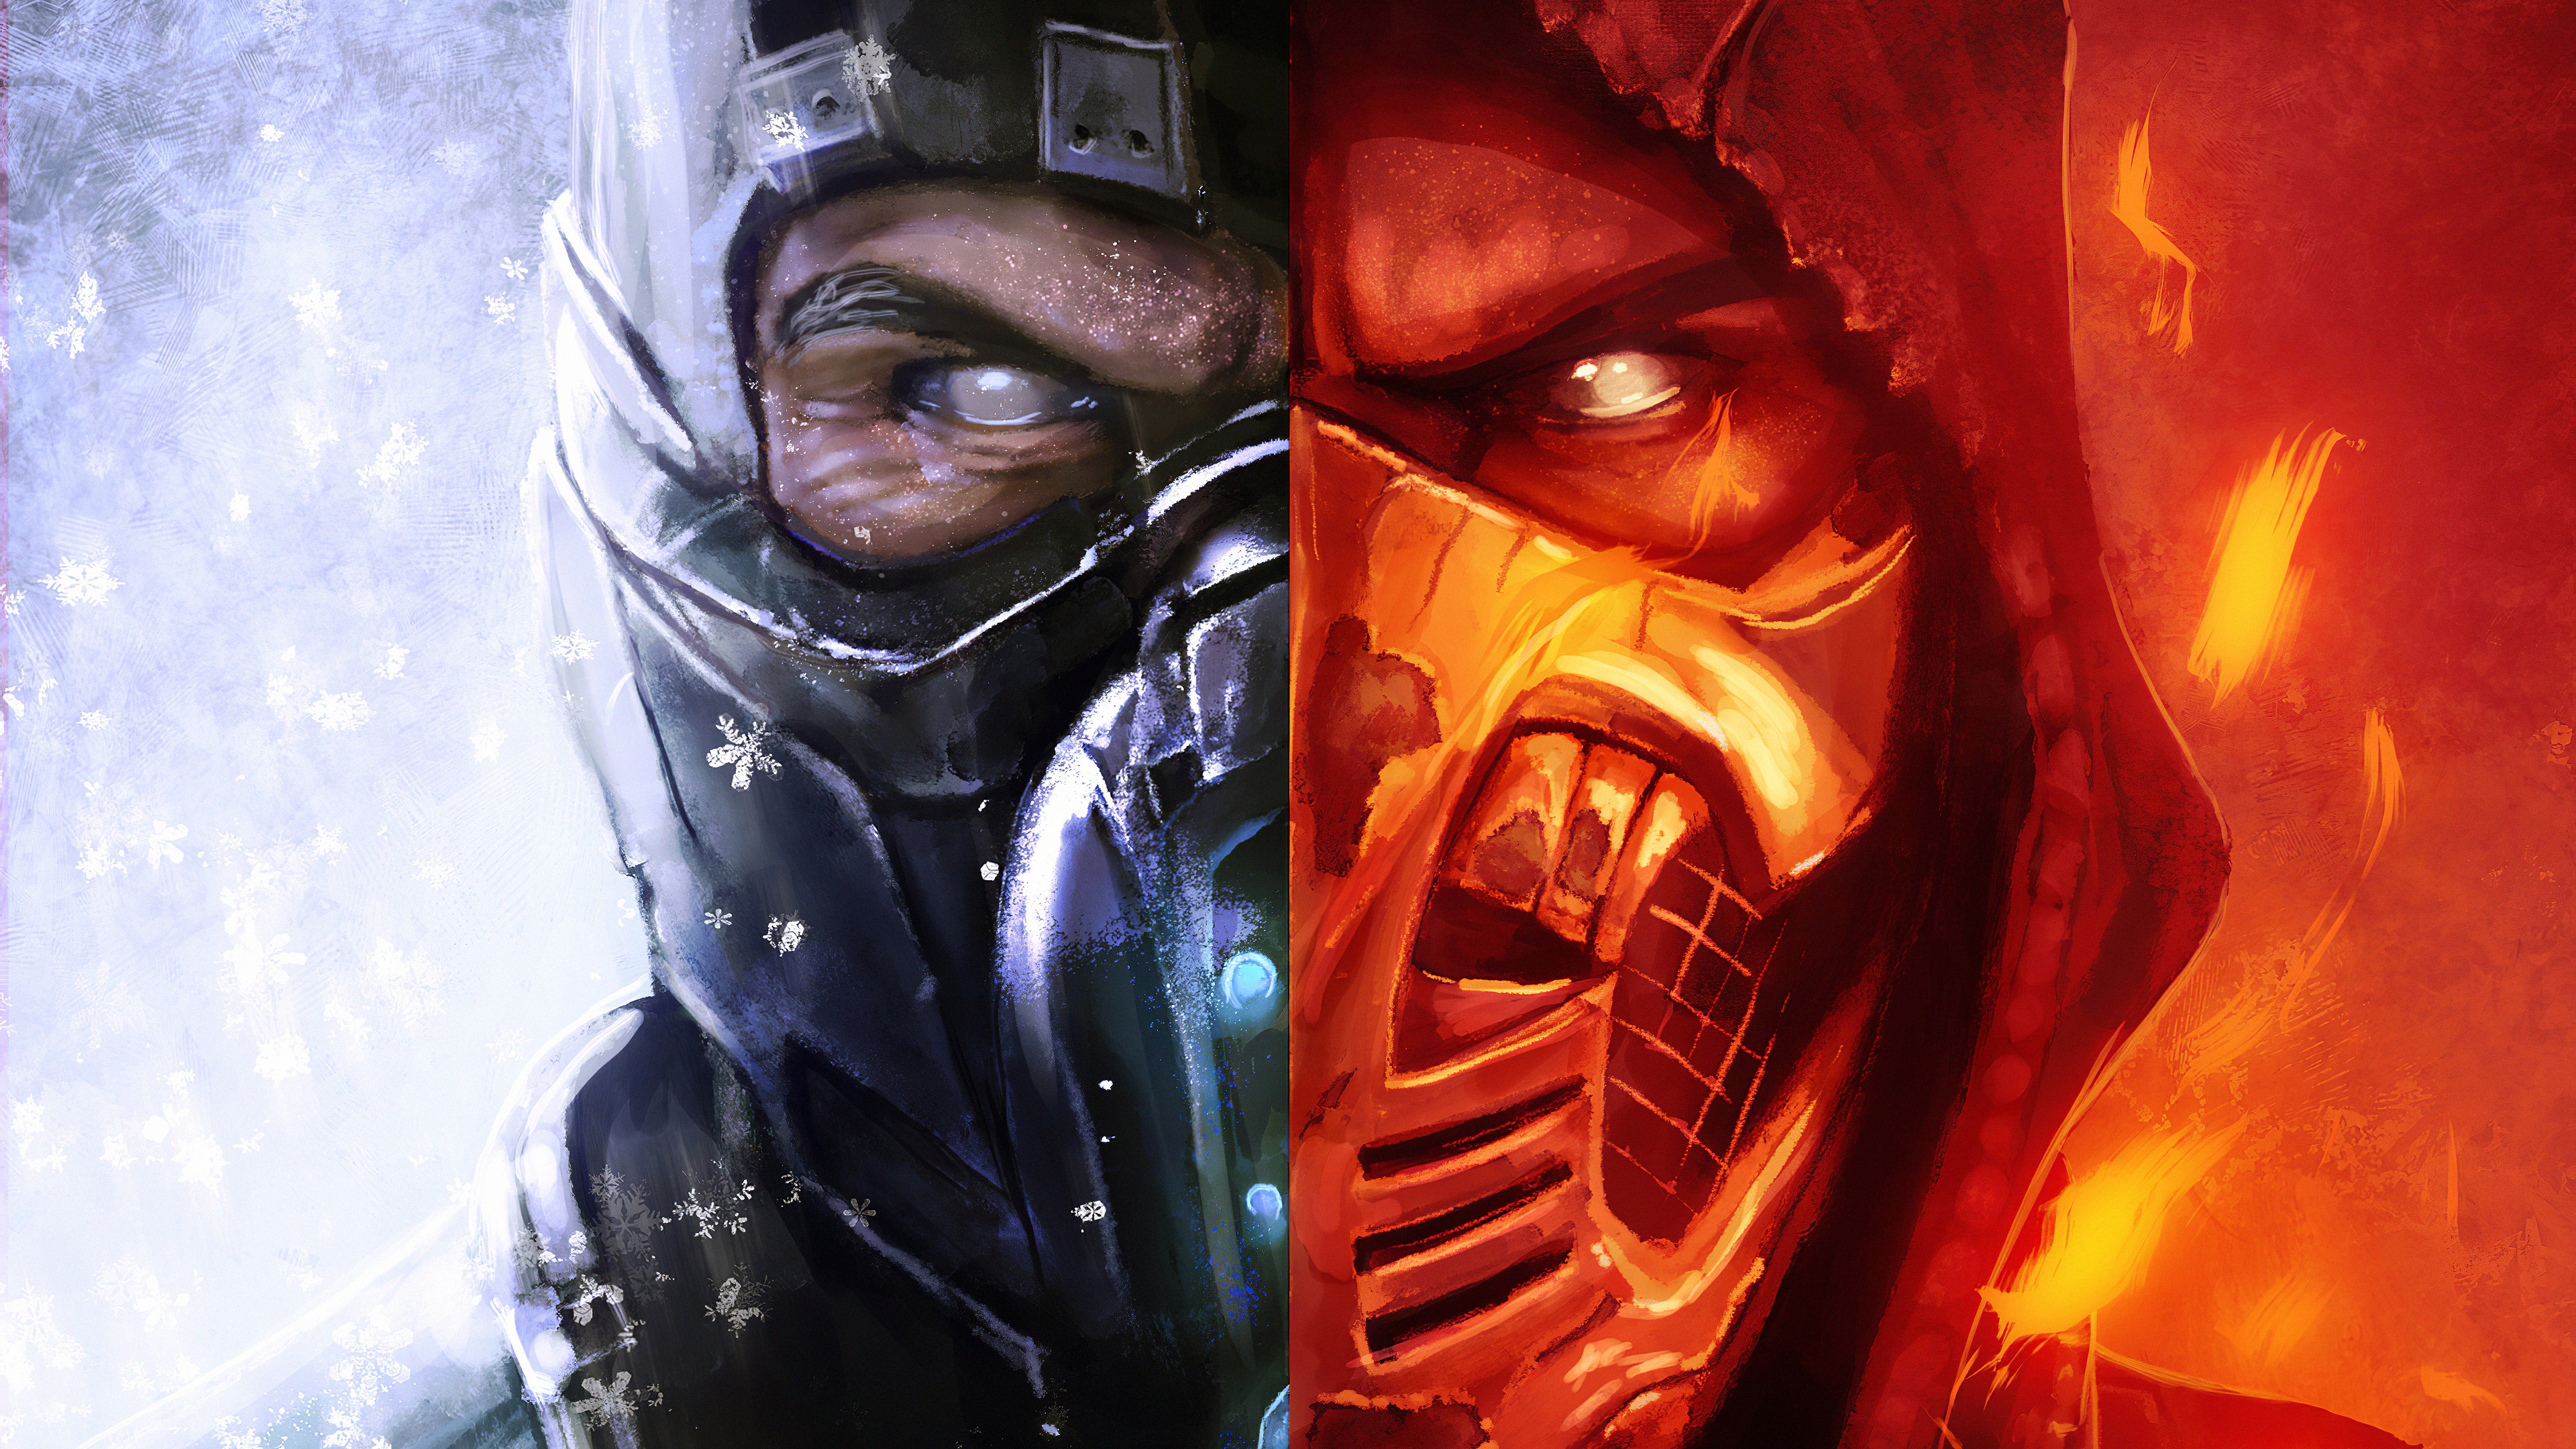 3840x2160 Scorpion Mortal Kombat X Art4k 4k Hd 4k Wallpapers